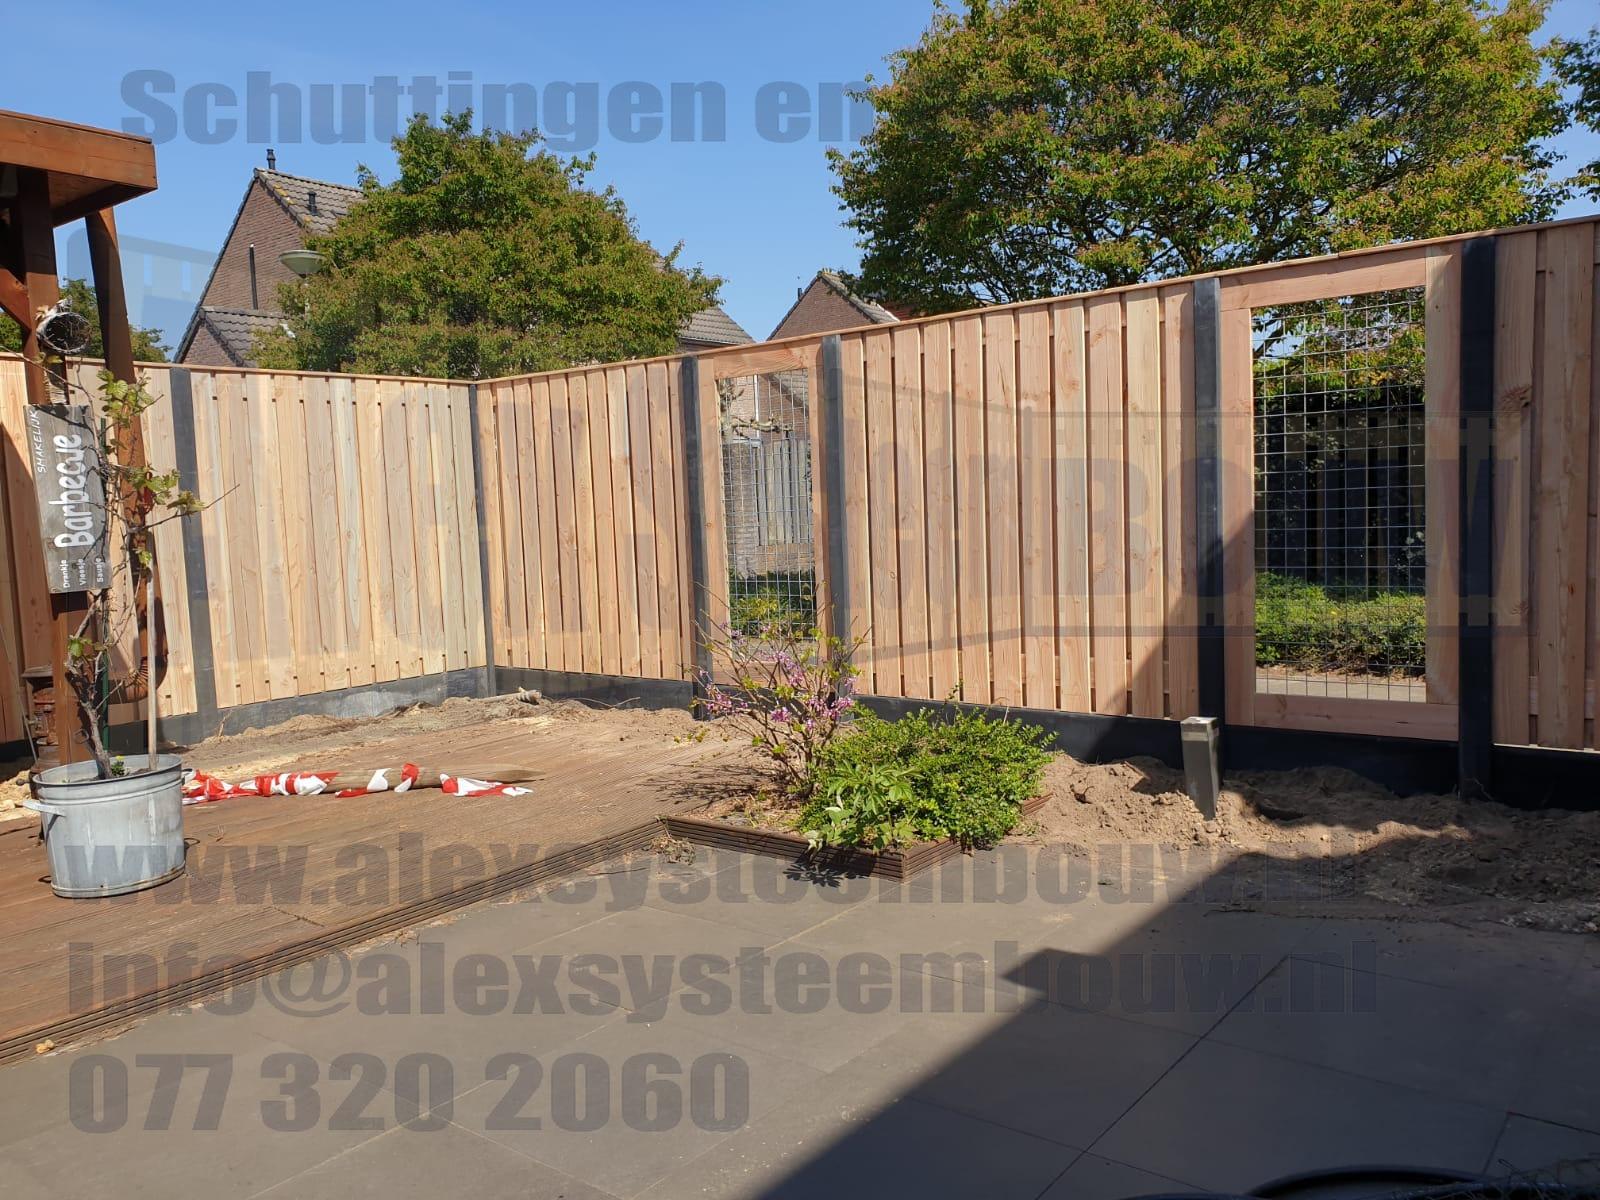 23 planks schutting hout beton lariks douglas met gaas schermen